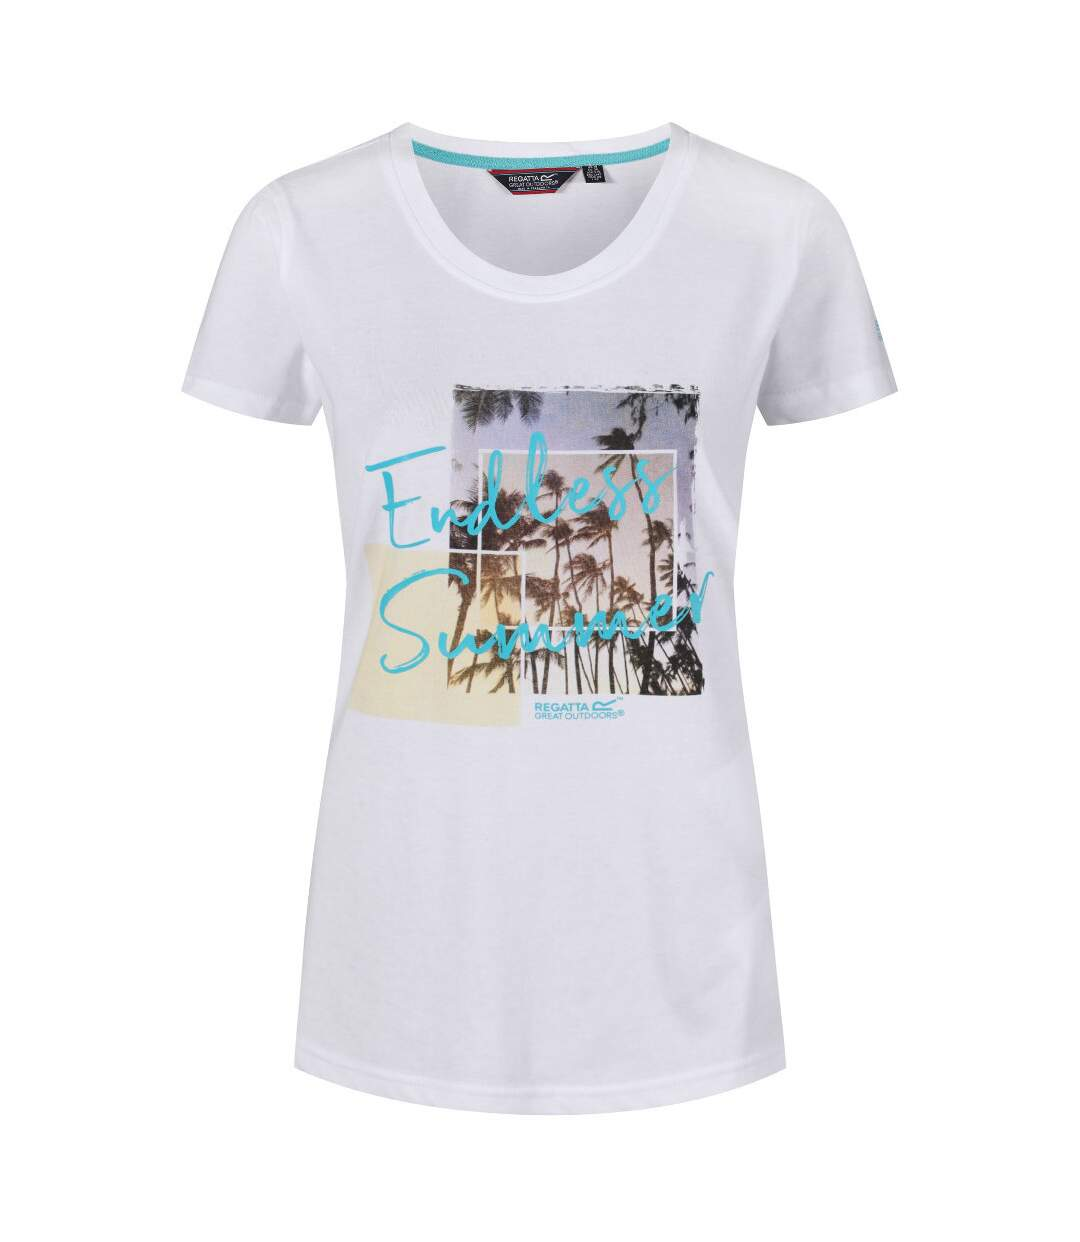 Regatta - T-Shirt Filandra - Femme (Blanc) - UTRG4117